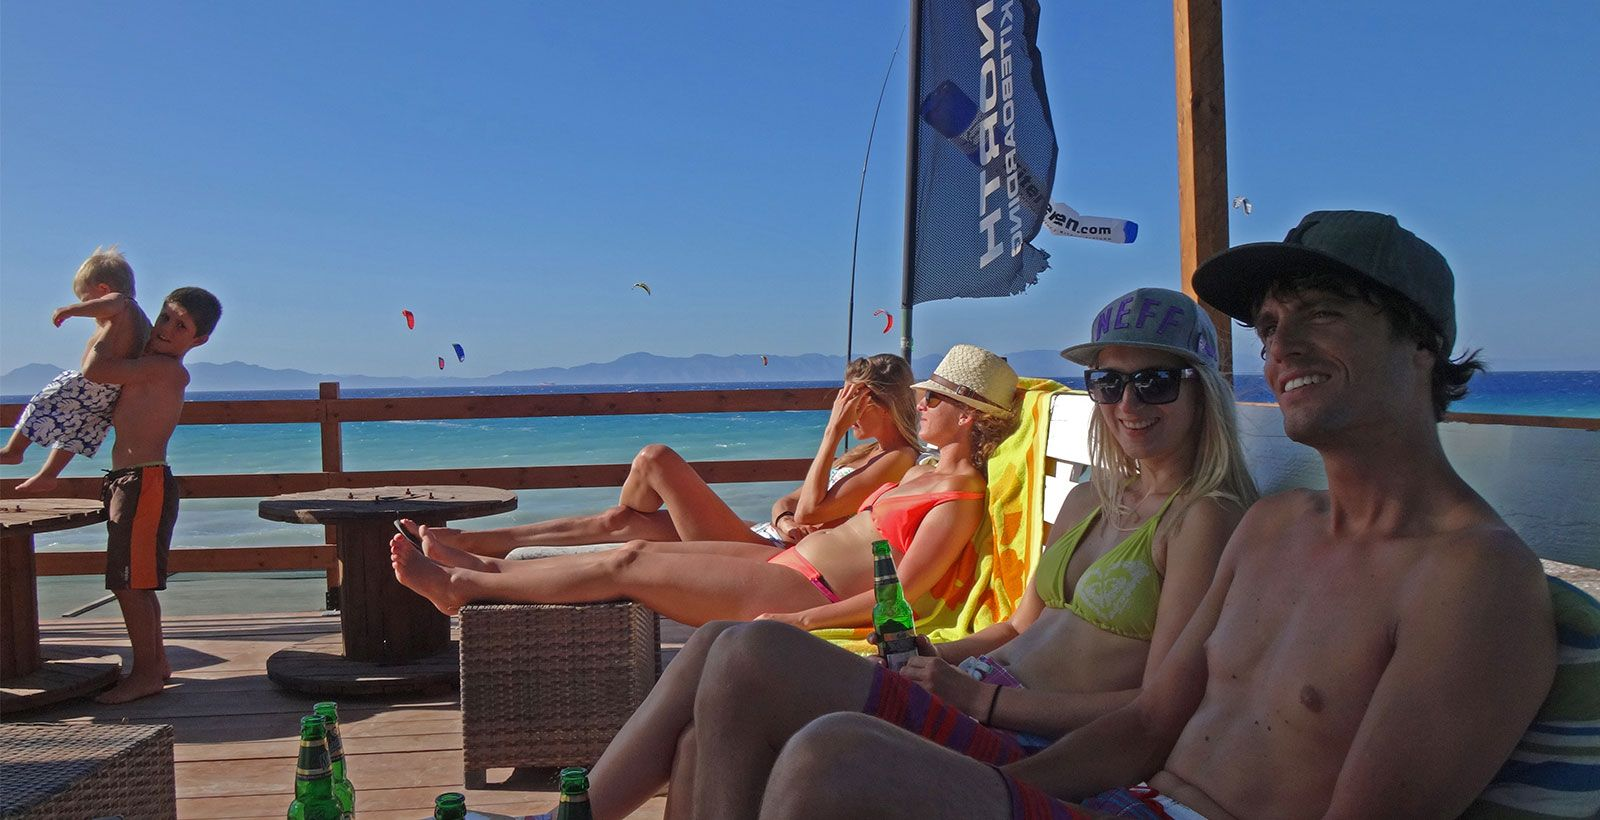 rooftop-kitesurfing-kite-air-riders-kitepro-center-kremasti-rhodes